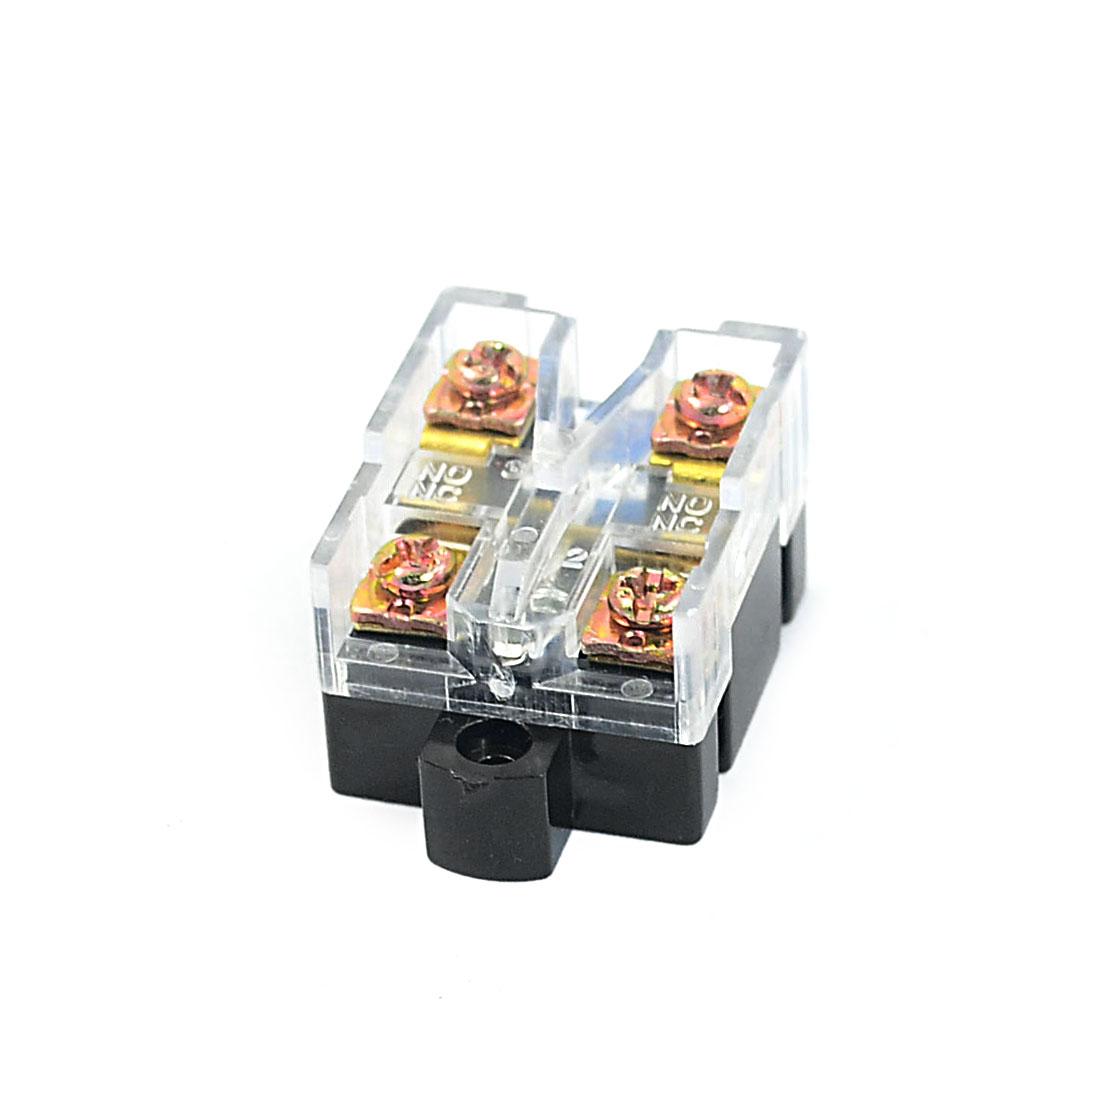 250V Plastic Housing DPST 4 Screw Terminals Button Actuator Limit Switch Black